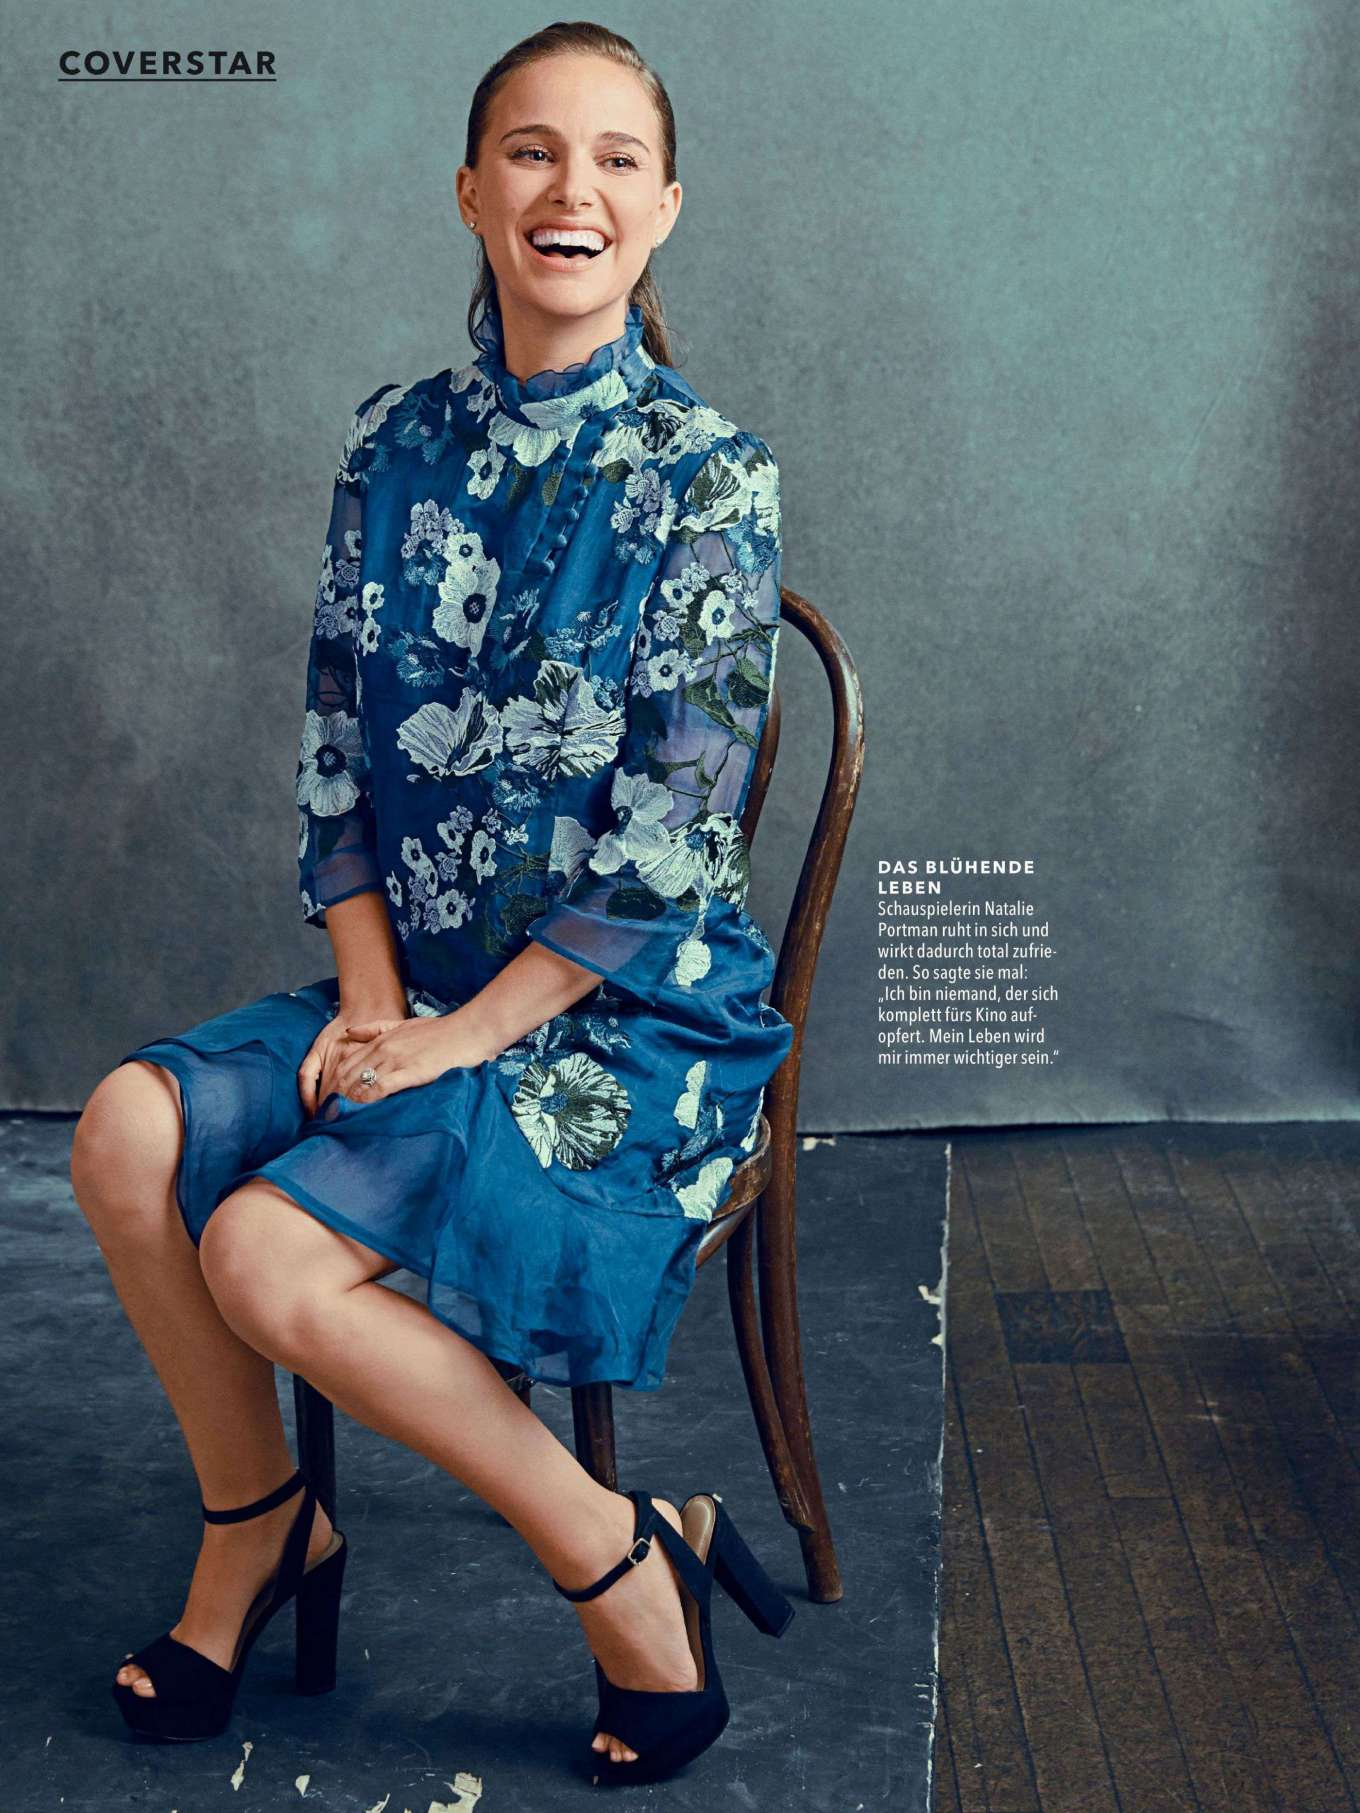 Natalie Portman - Cosmopolitan Germany Magazine (July 2019)